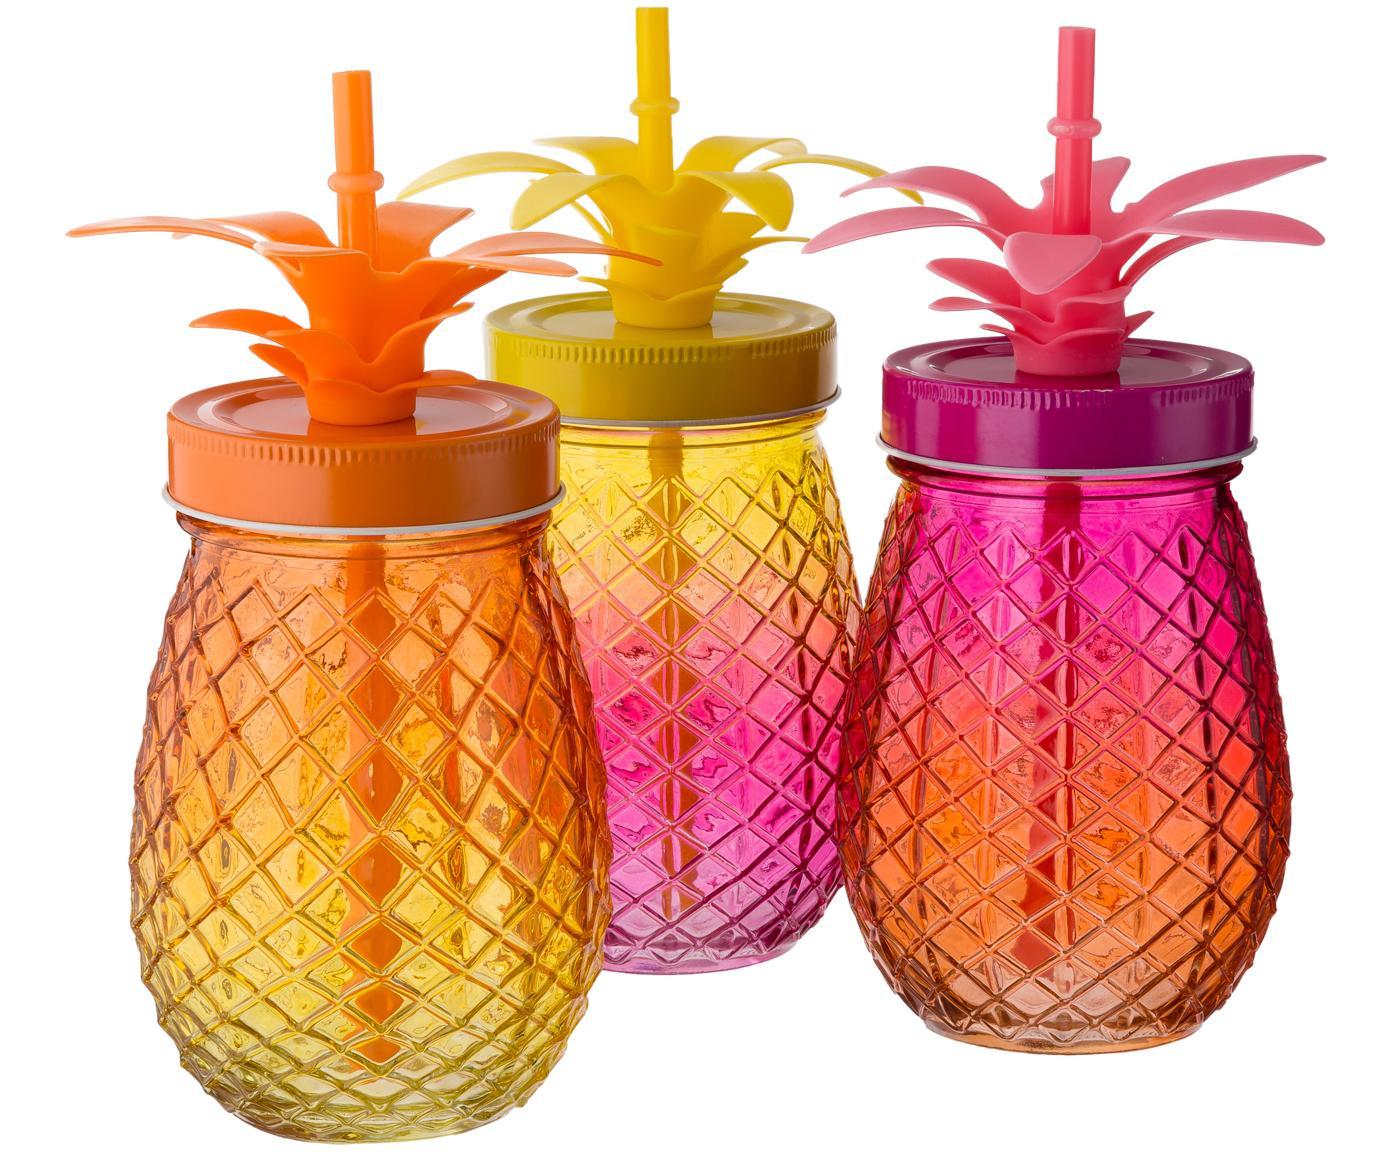 Drinkglazenset Pineapples, 3-delig, Drinkglas: glas, Deksel: metaal, Rietje: kunststof, Roze, oranje, geel, Ø 9 x H 14 cm